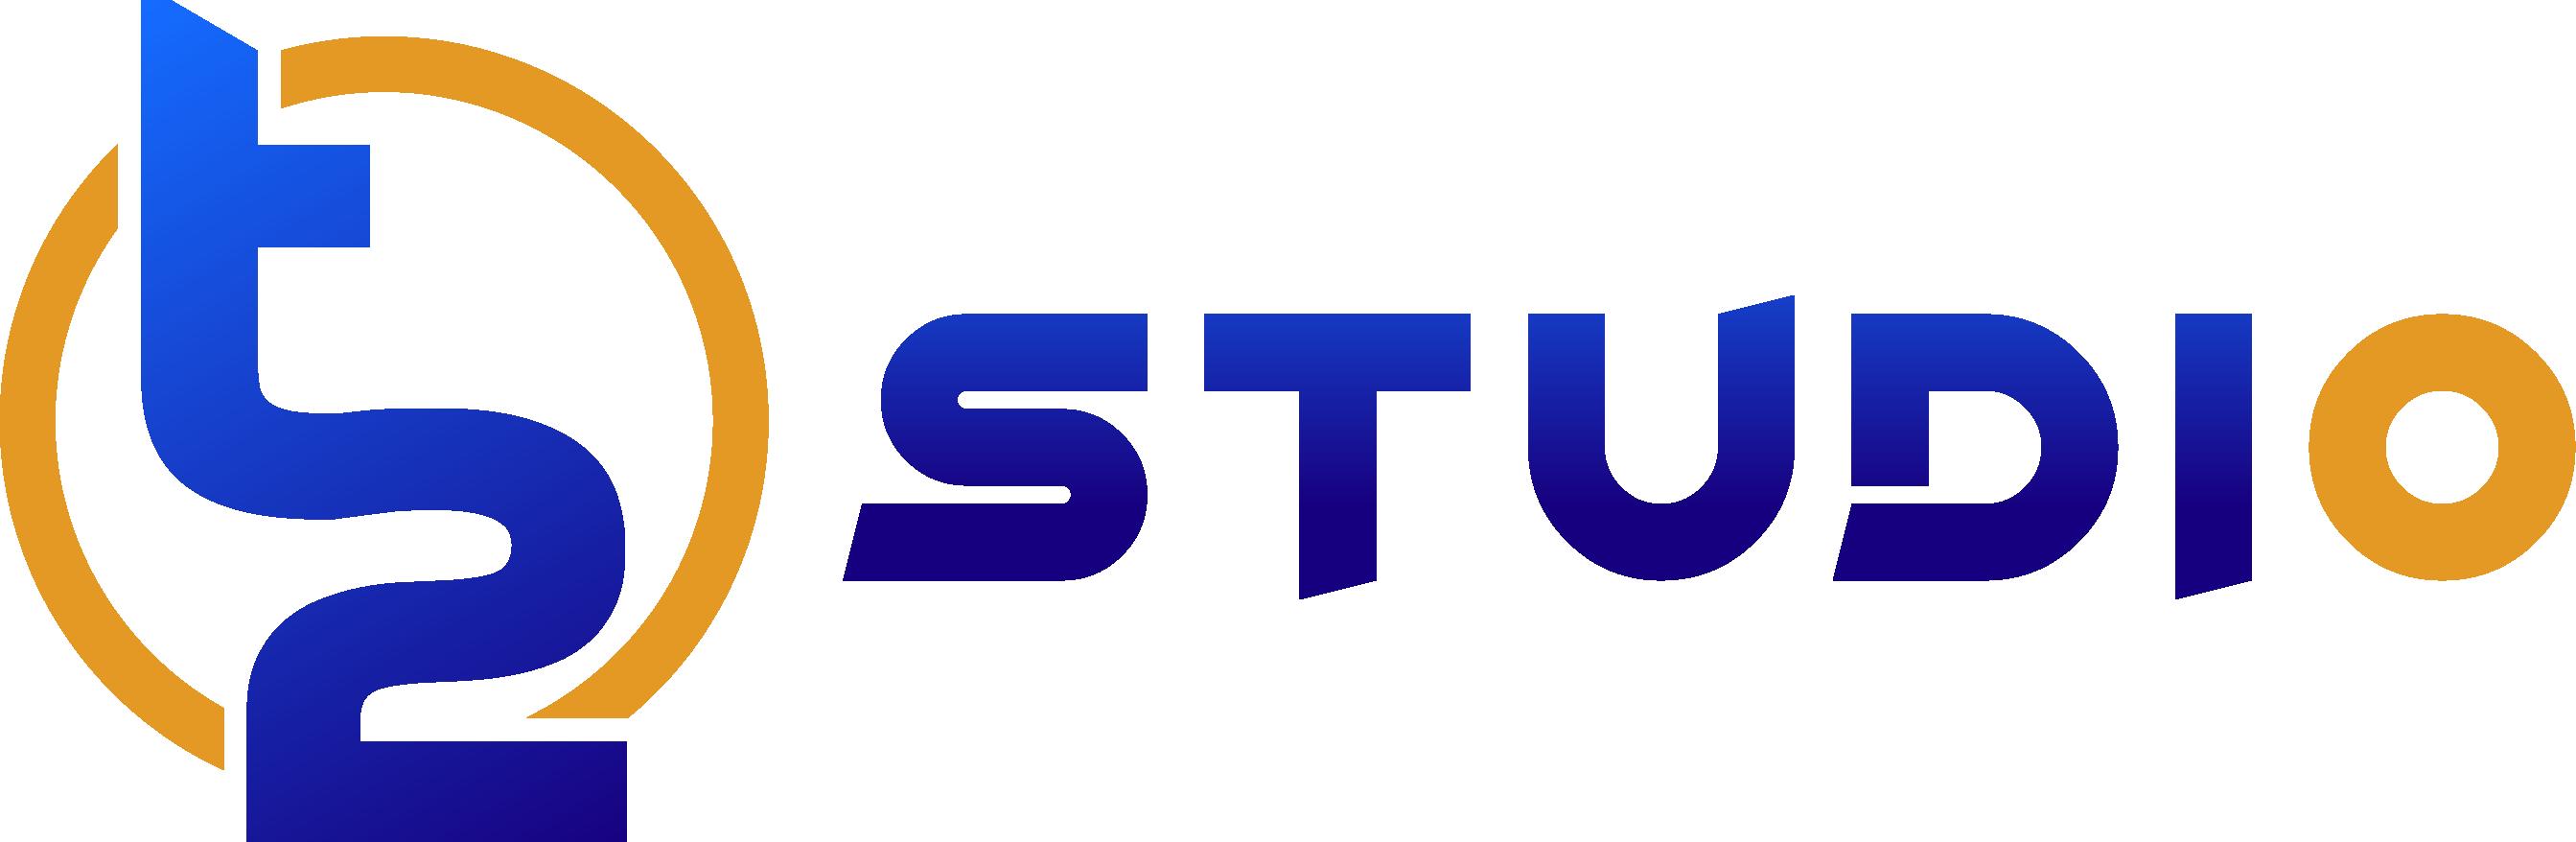 T2Studio